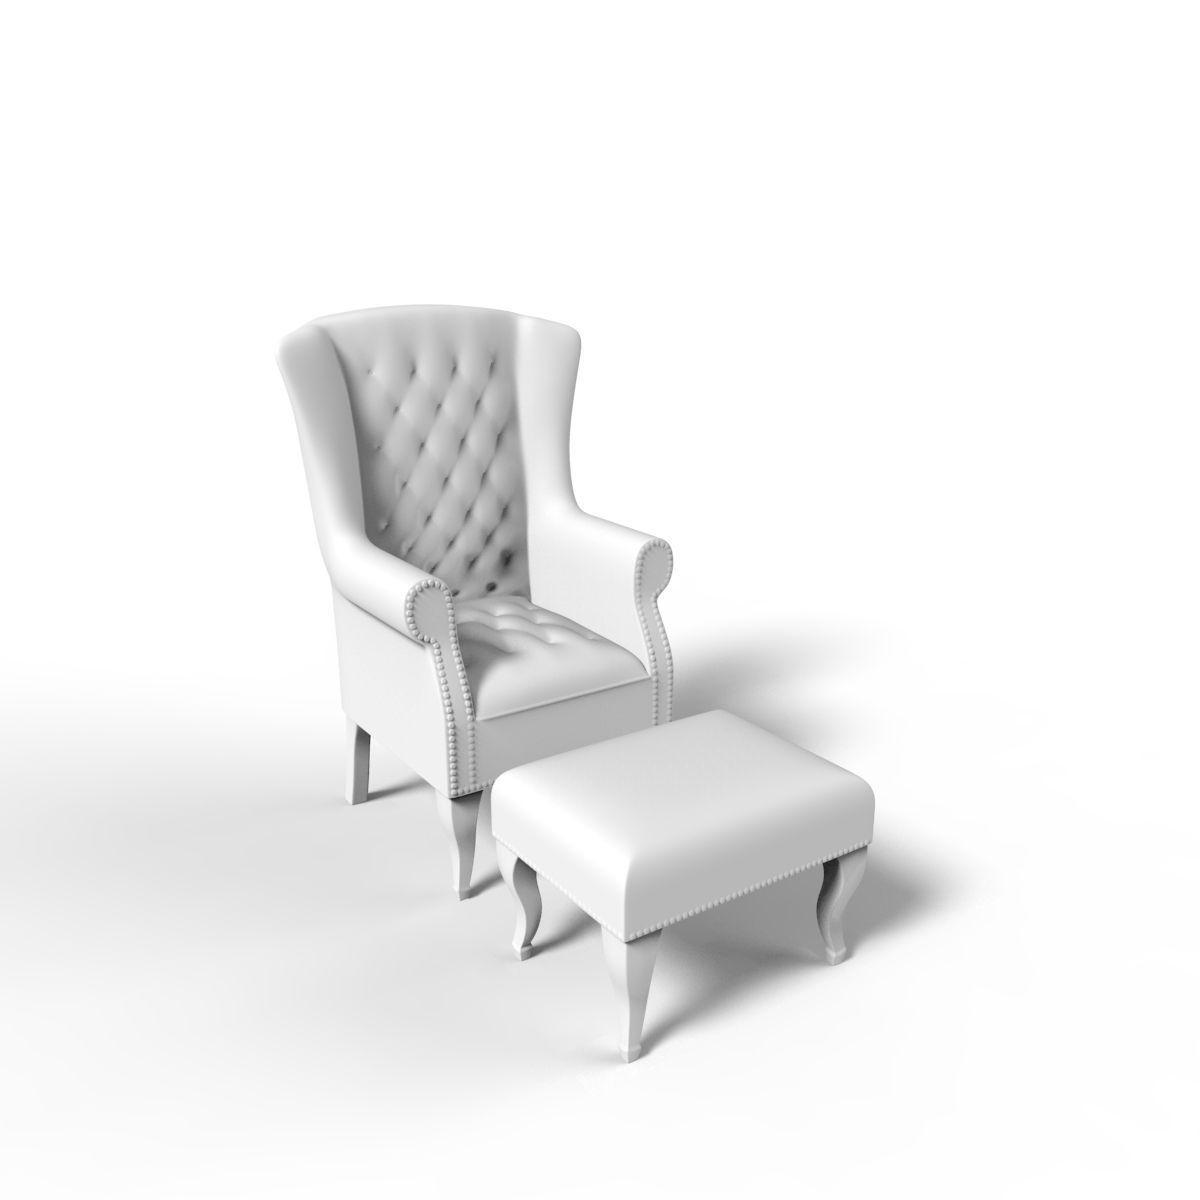 Miniature 3d Print Ready Chair 19 3d Model 3d Printable